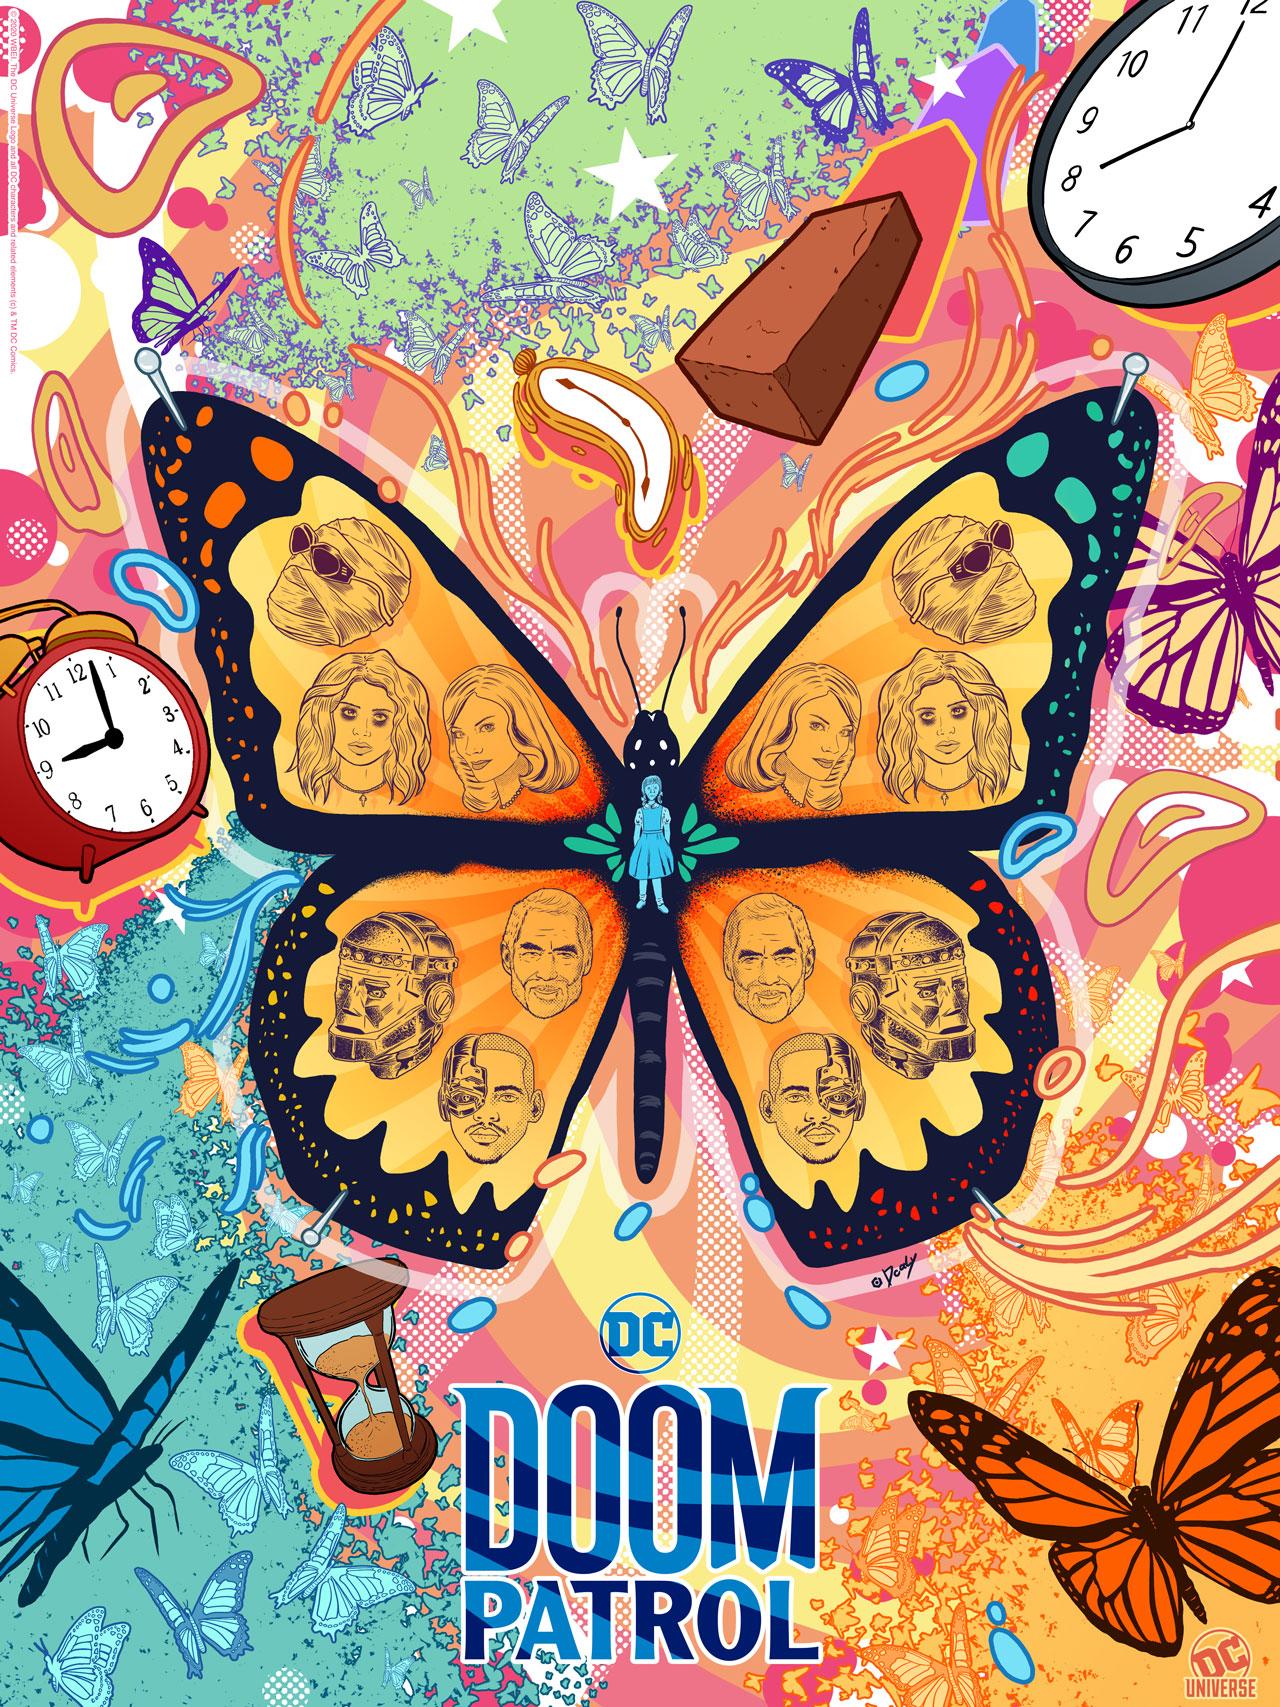 Doom-patrol-Season-2-poster.jpg